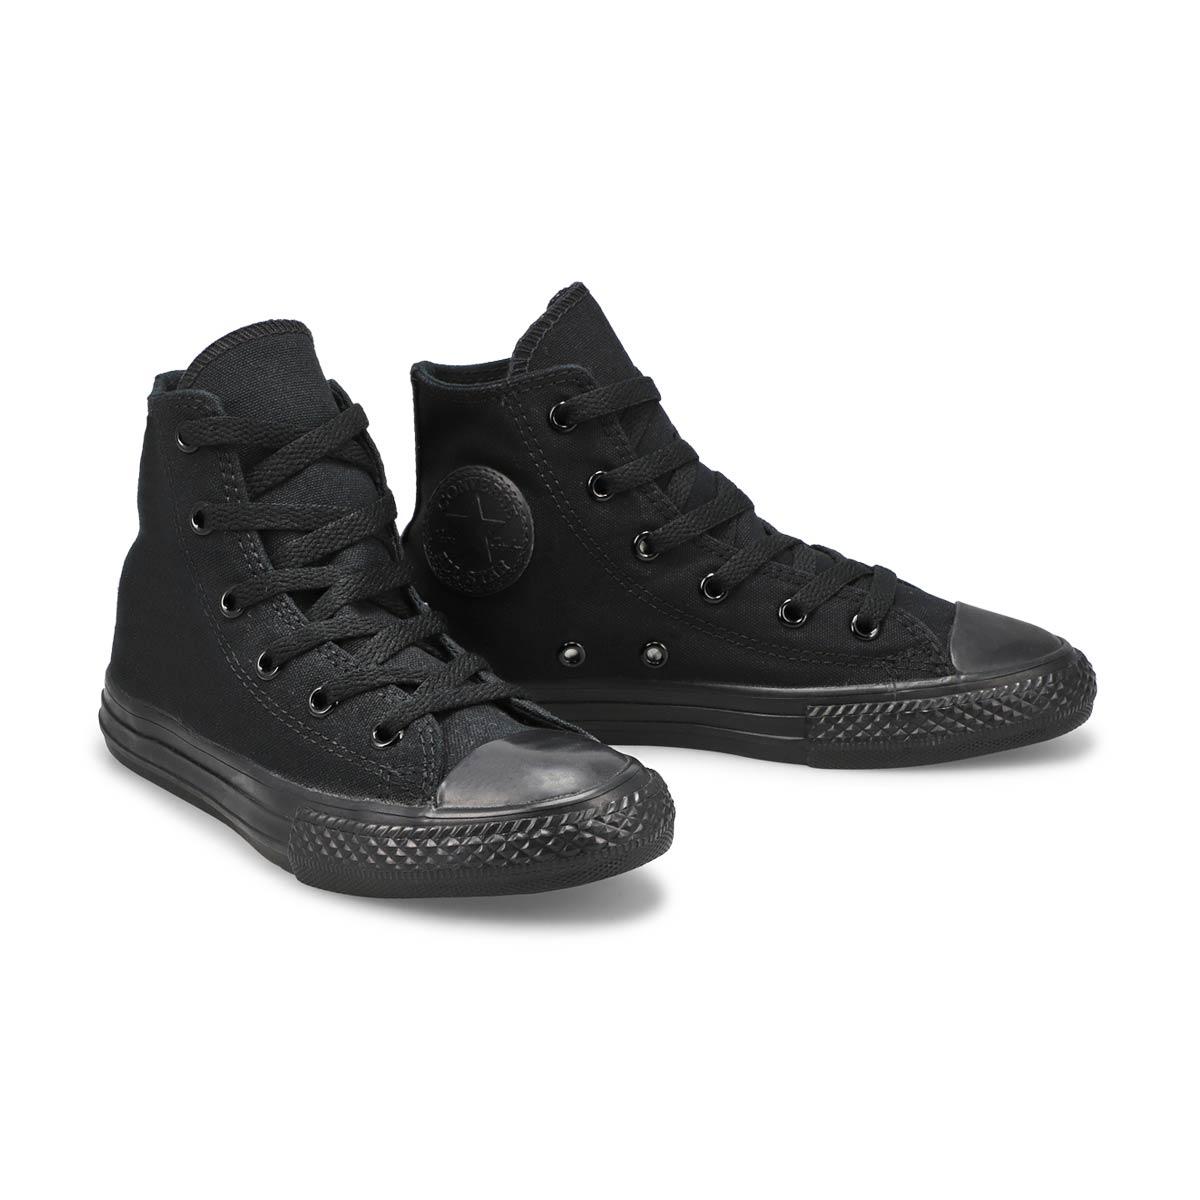 Kids' Chuck Taylor All Star Hi Top Sneaker